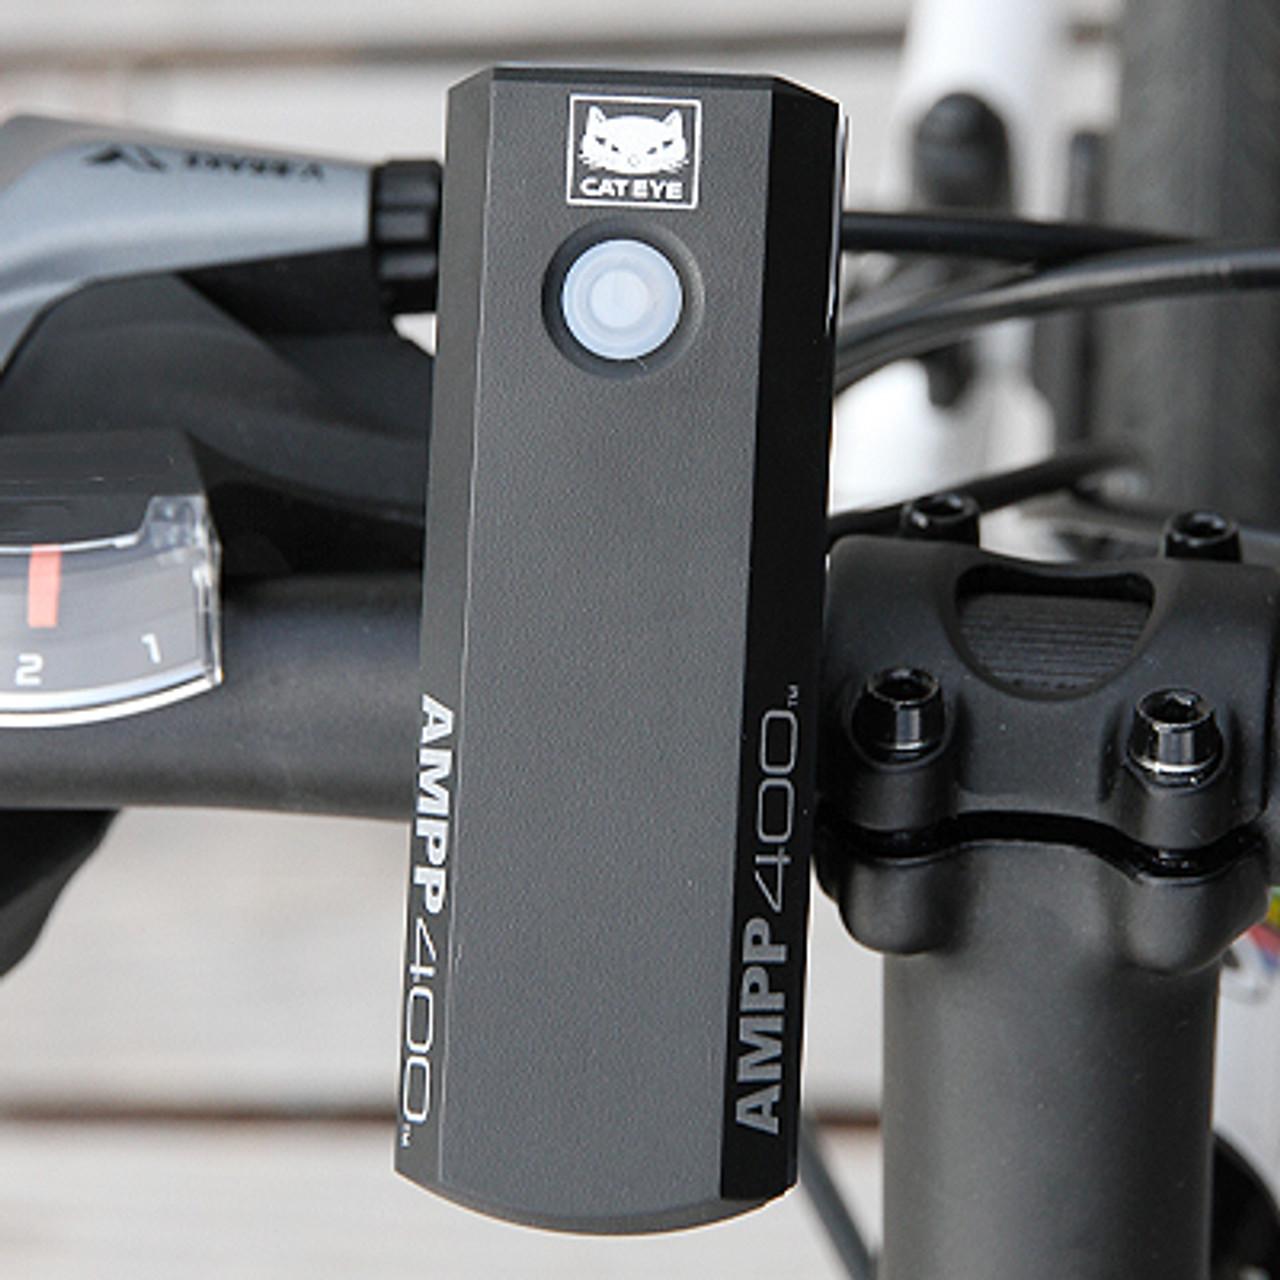 Cateye AMPP400 Bicycle Light